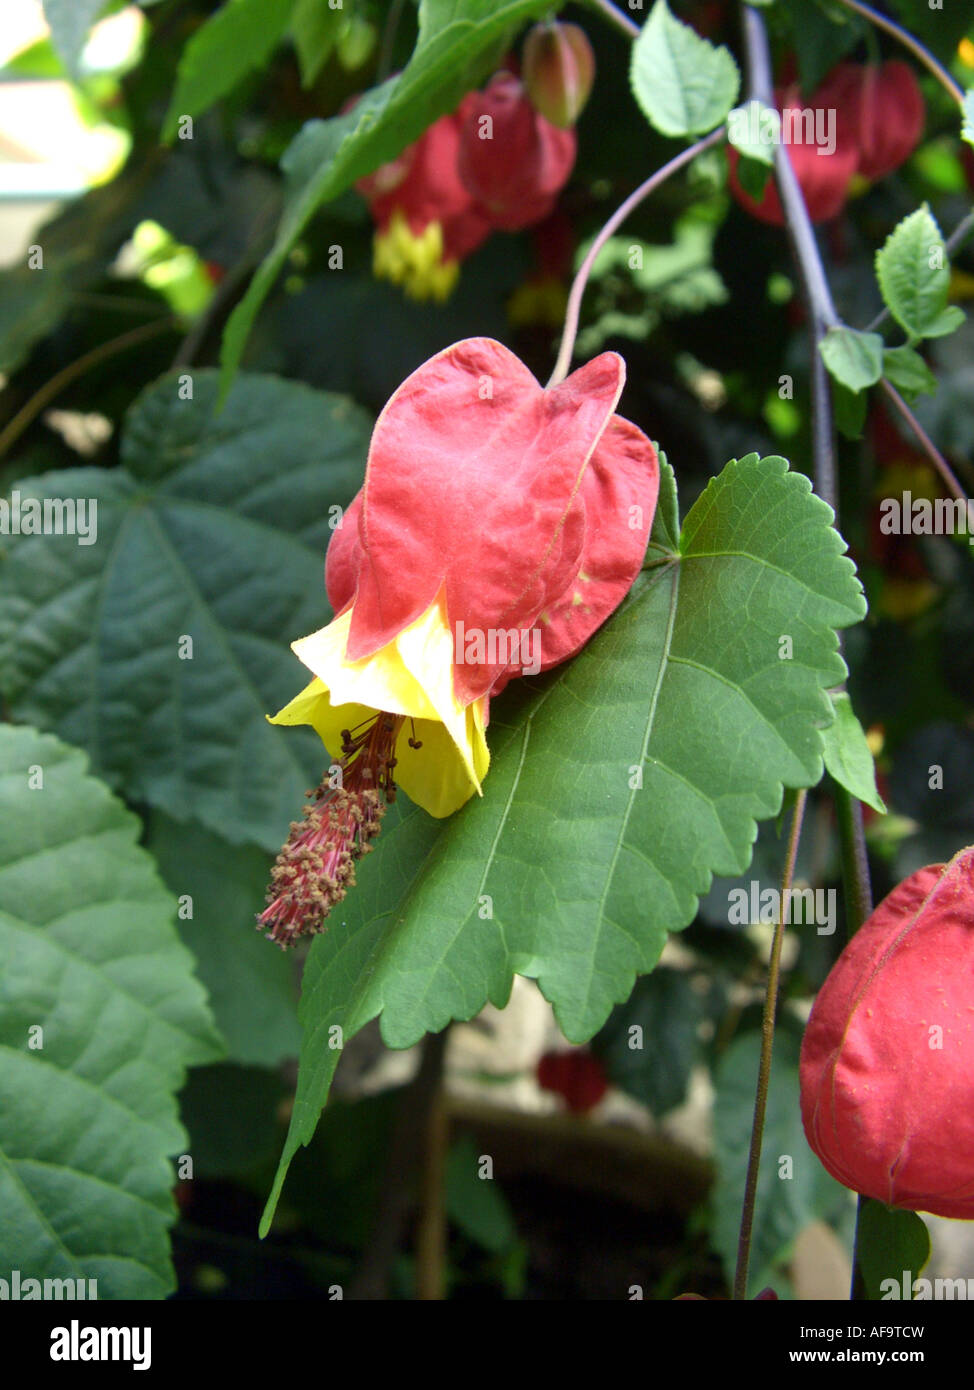 Trailing Abutilon Abutilon Megapotamicum Flower Stock Photo